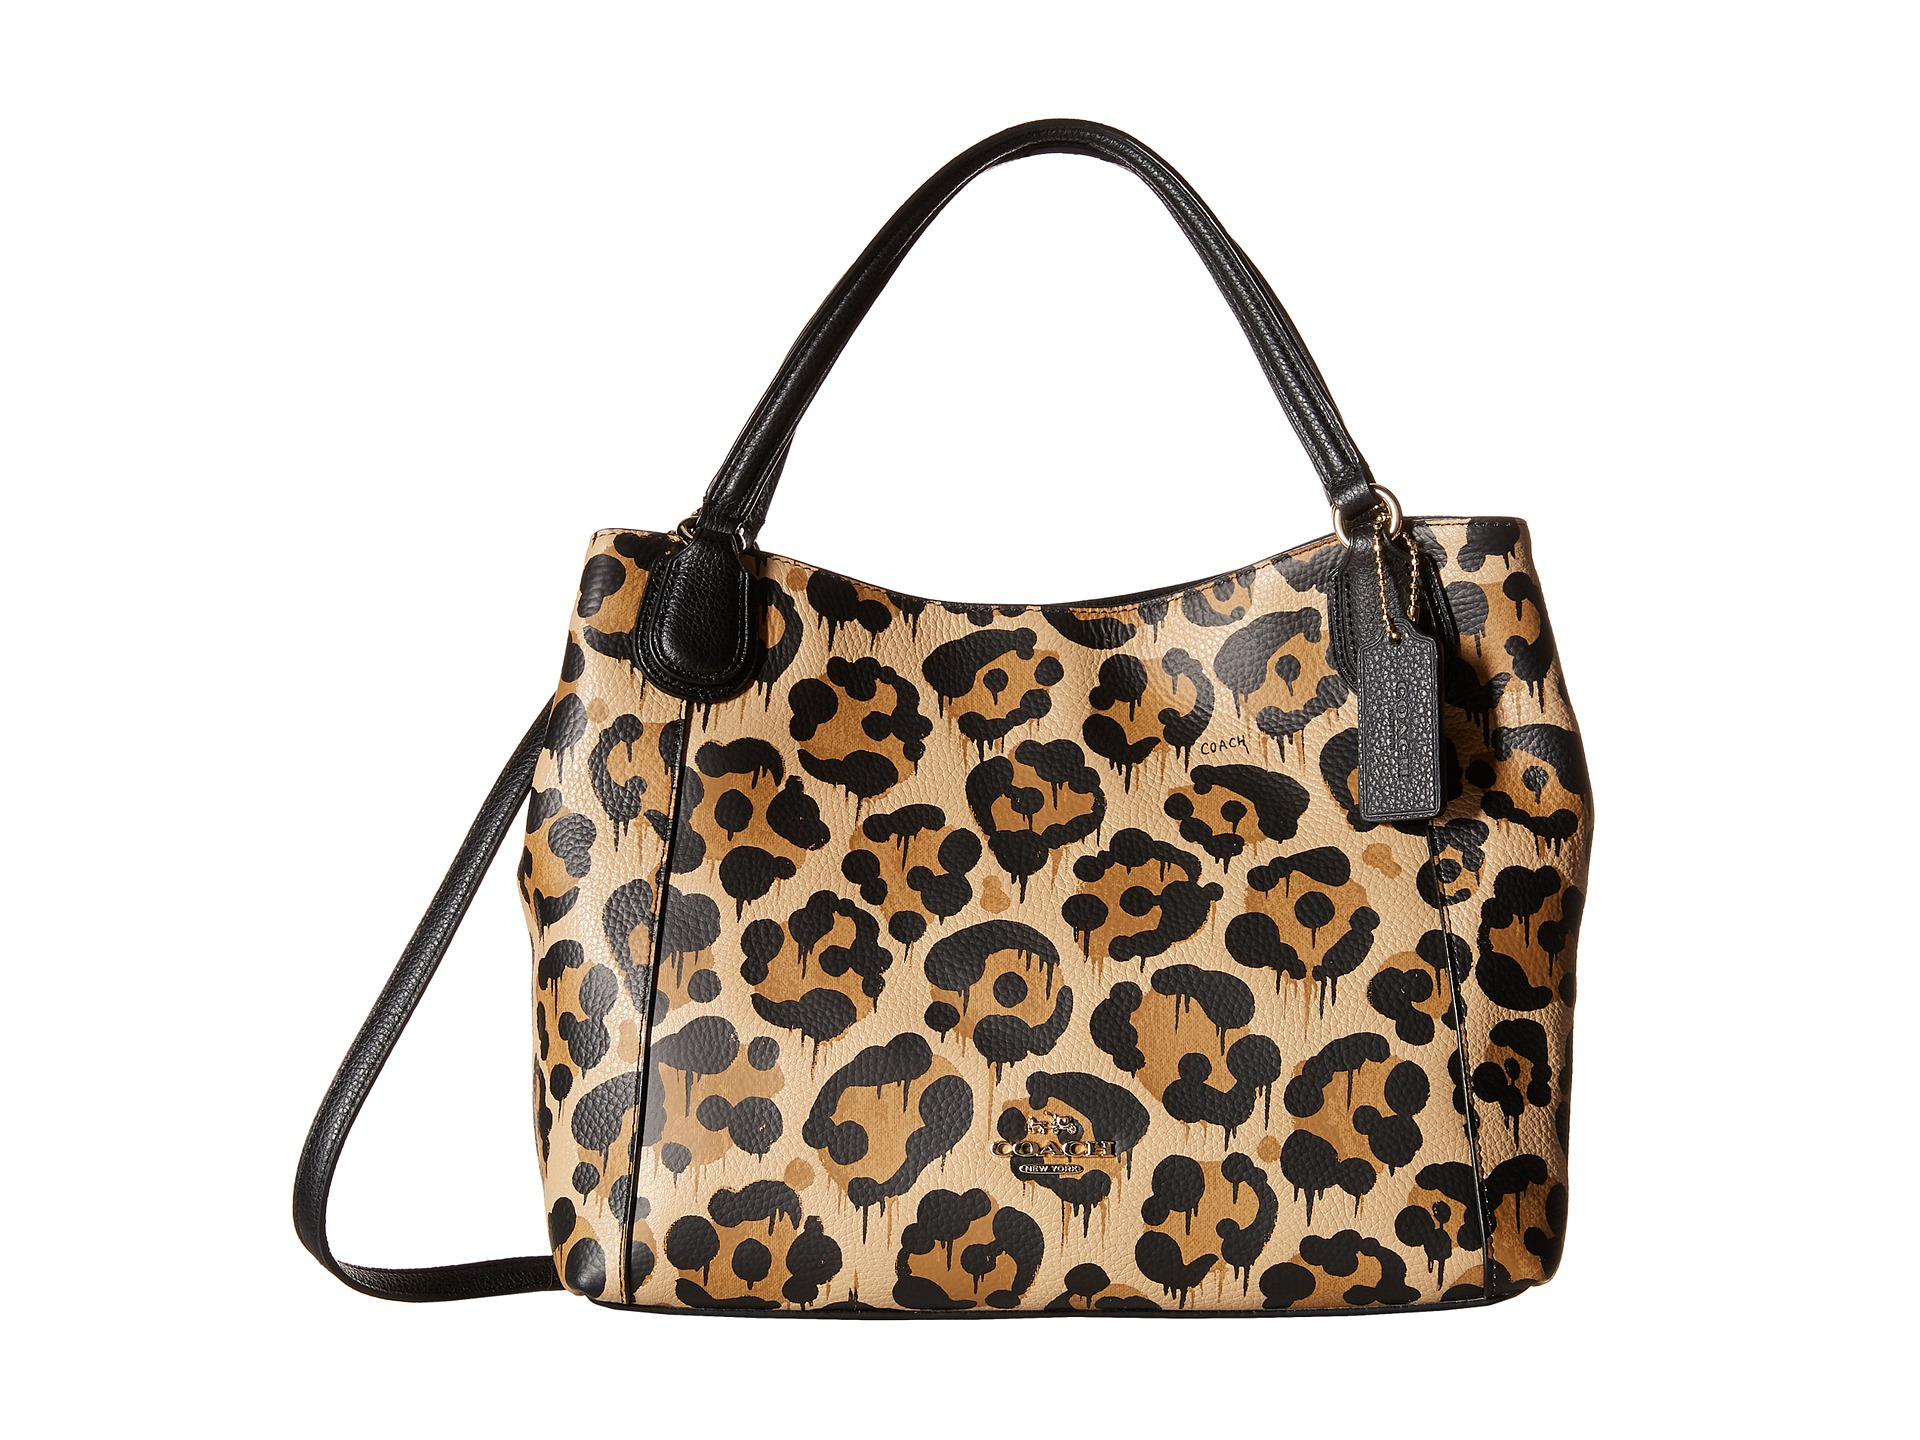 ... Coach Leopard Ocelot Print Edie 28 in Brown Lyst ... 28 In Wild Beast  Print Leather ... e5c179704f39c